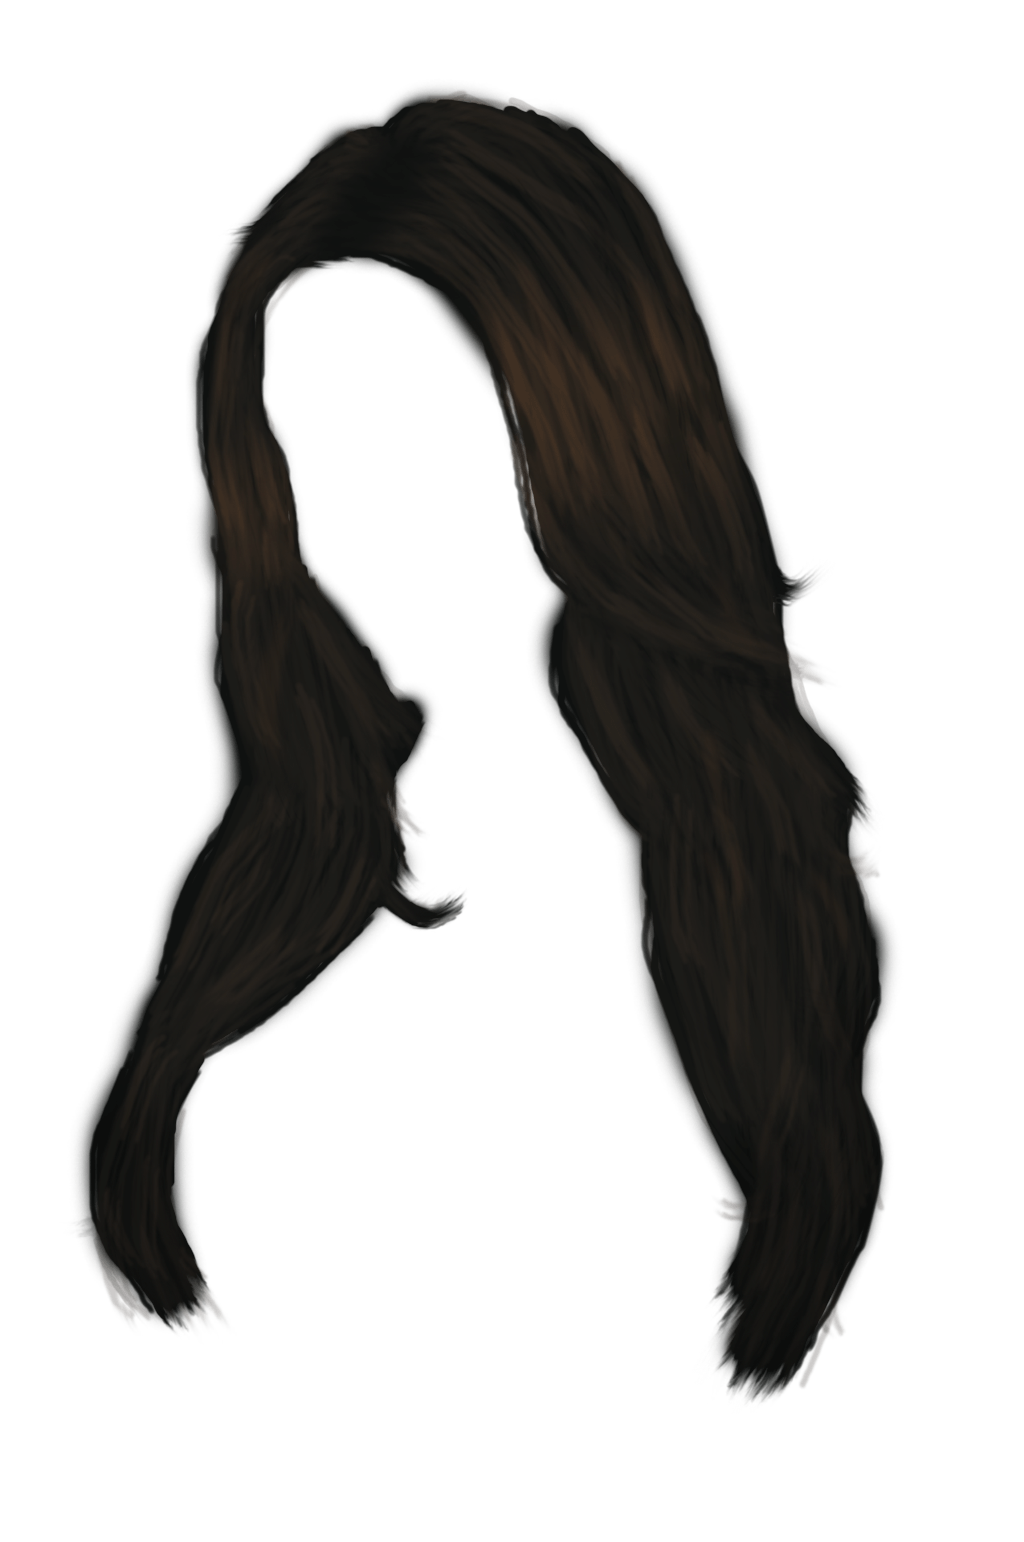 Long Black Women Hair Transparent Png Stickpng